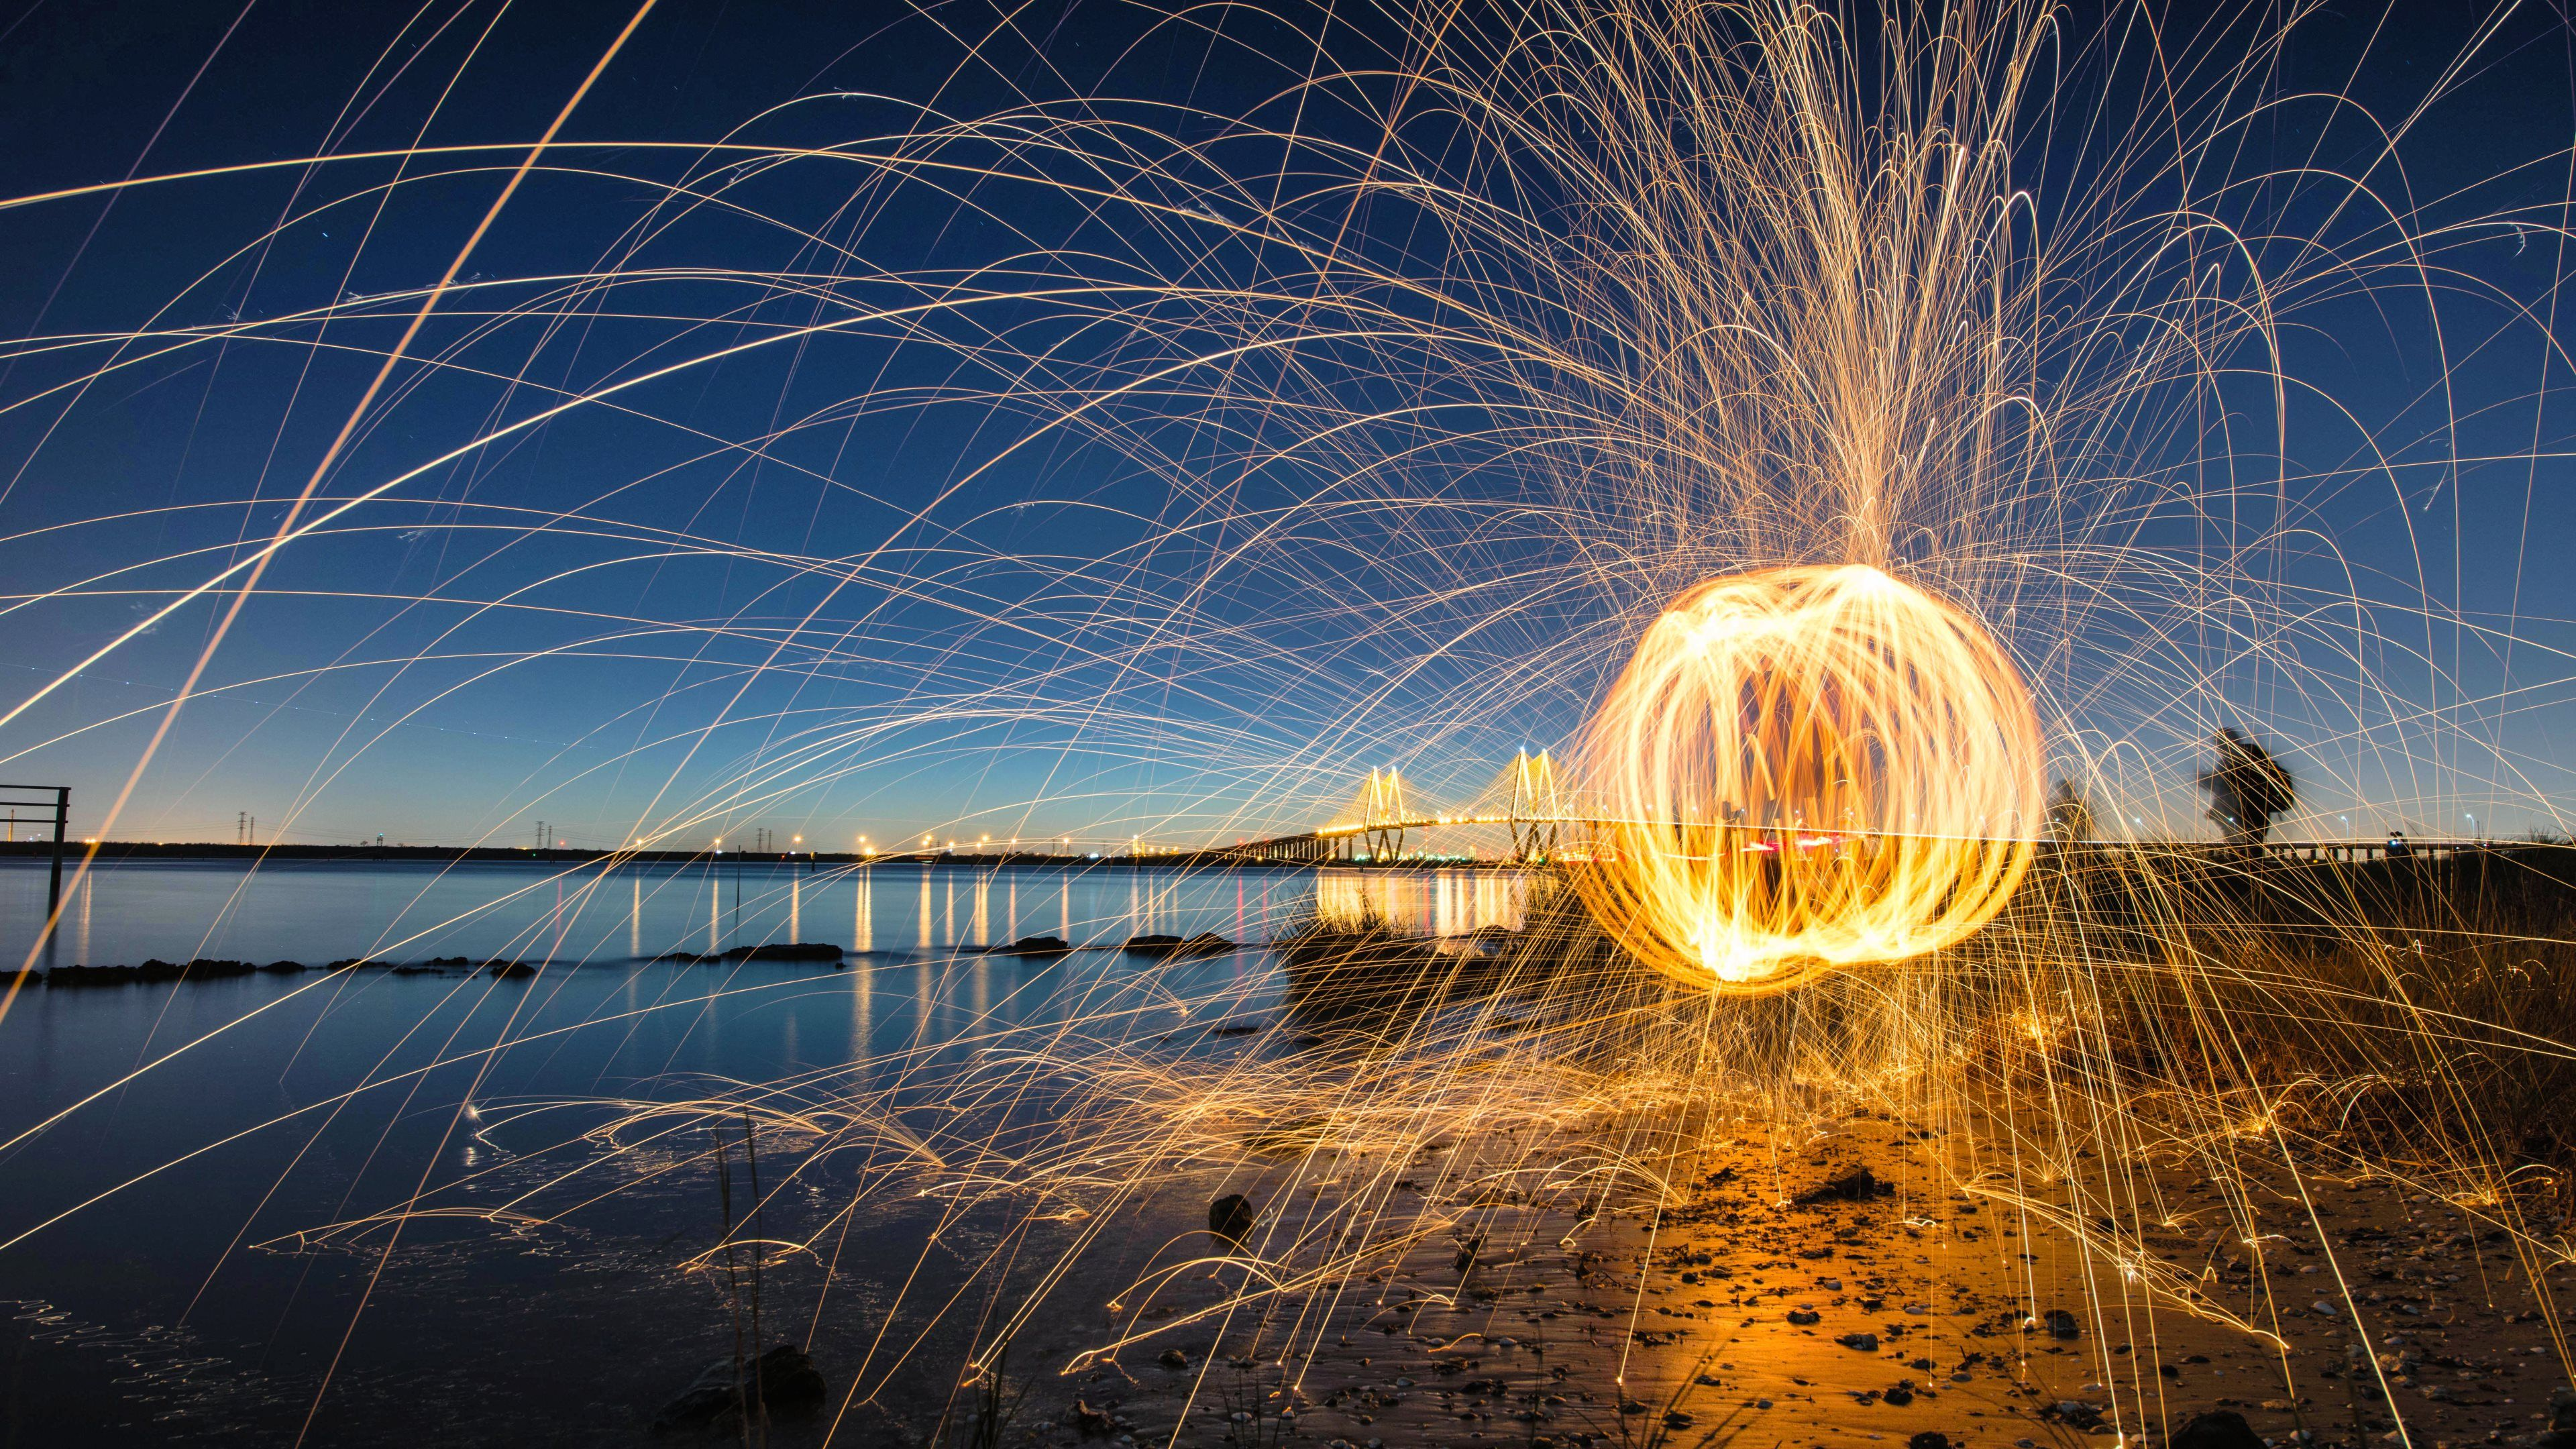 Photography Fireworks Ocean Bridge Hd 4k